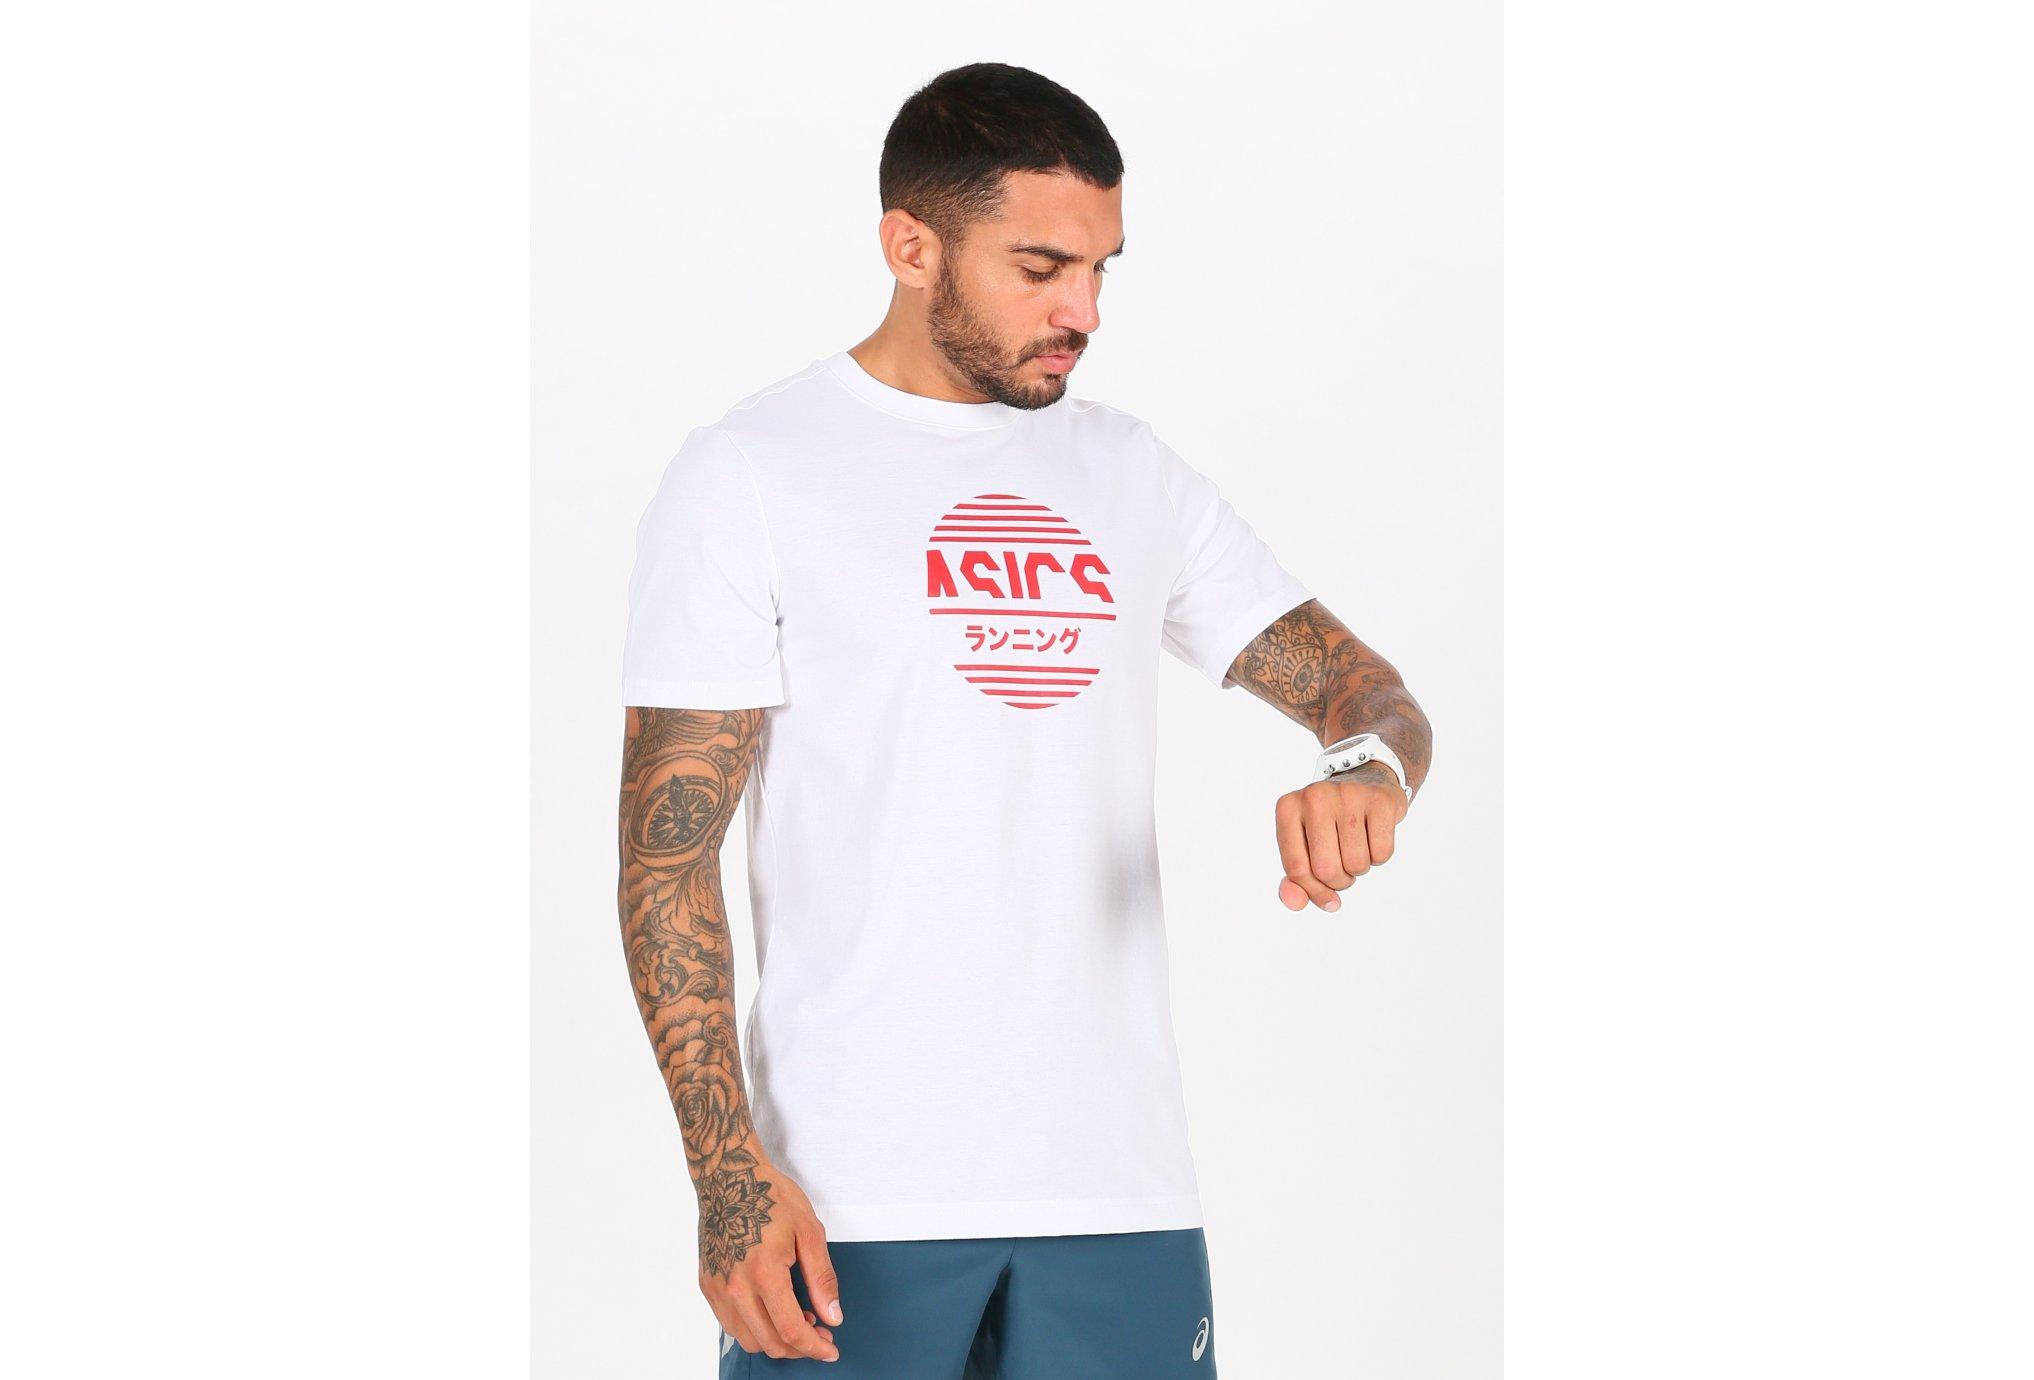 Asics Tokyo Graphic Japan M vêtement running homme